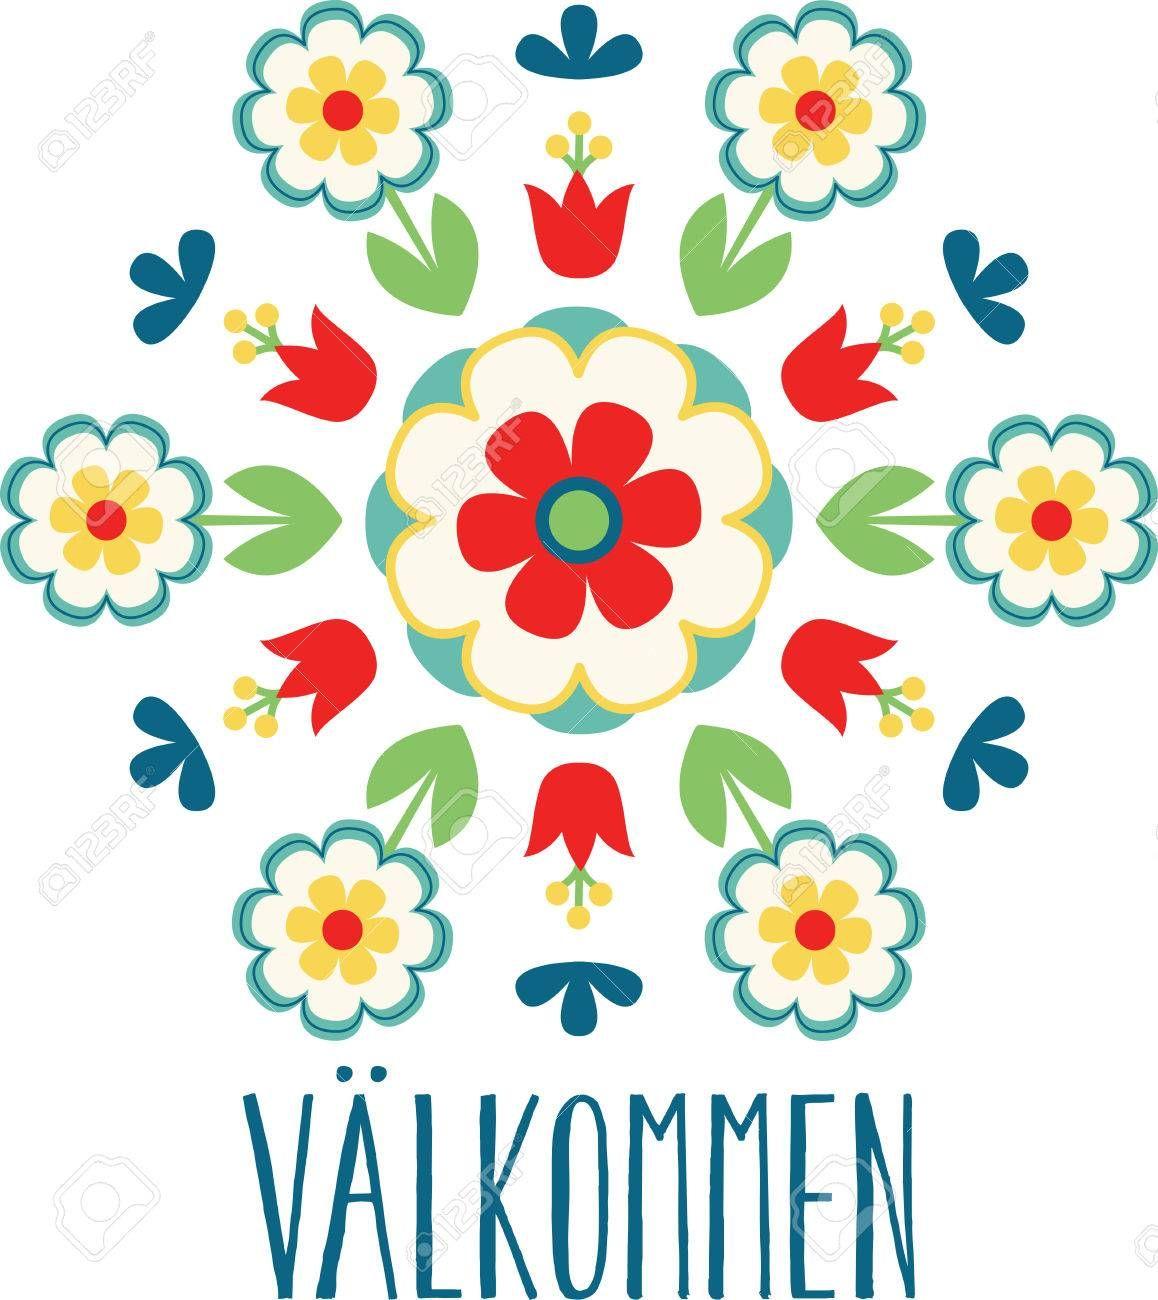 Use This Versatile Traditional Scandinavian Swedish Decorative Scandinavian Folk Art Folk Art Decor Folk Art Flowers